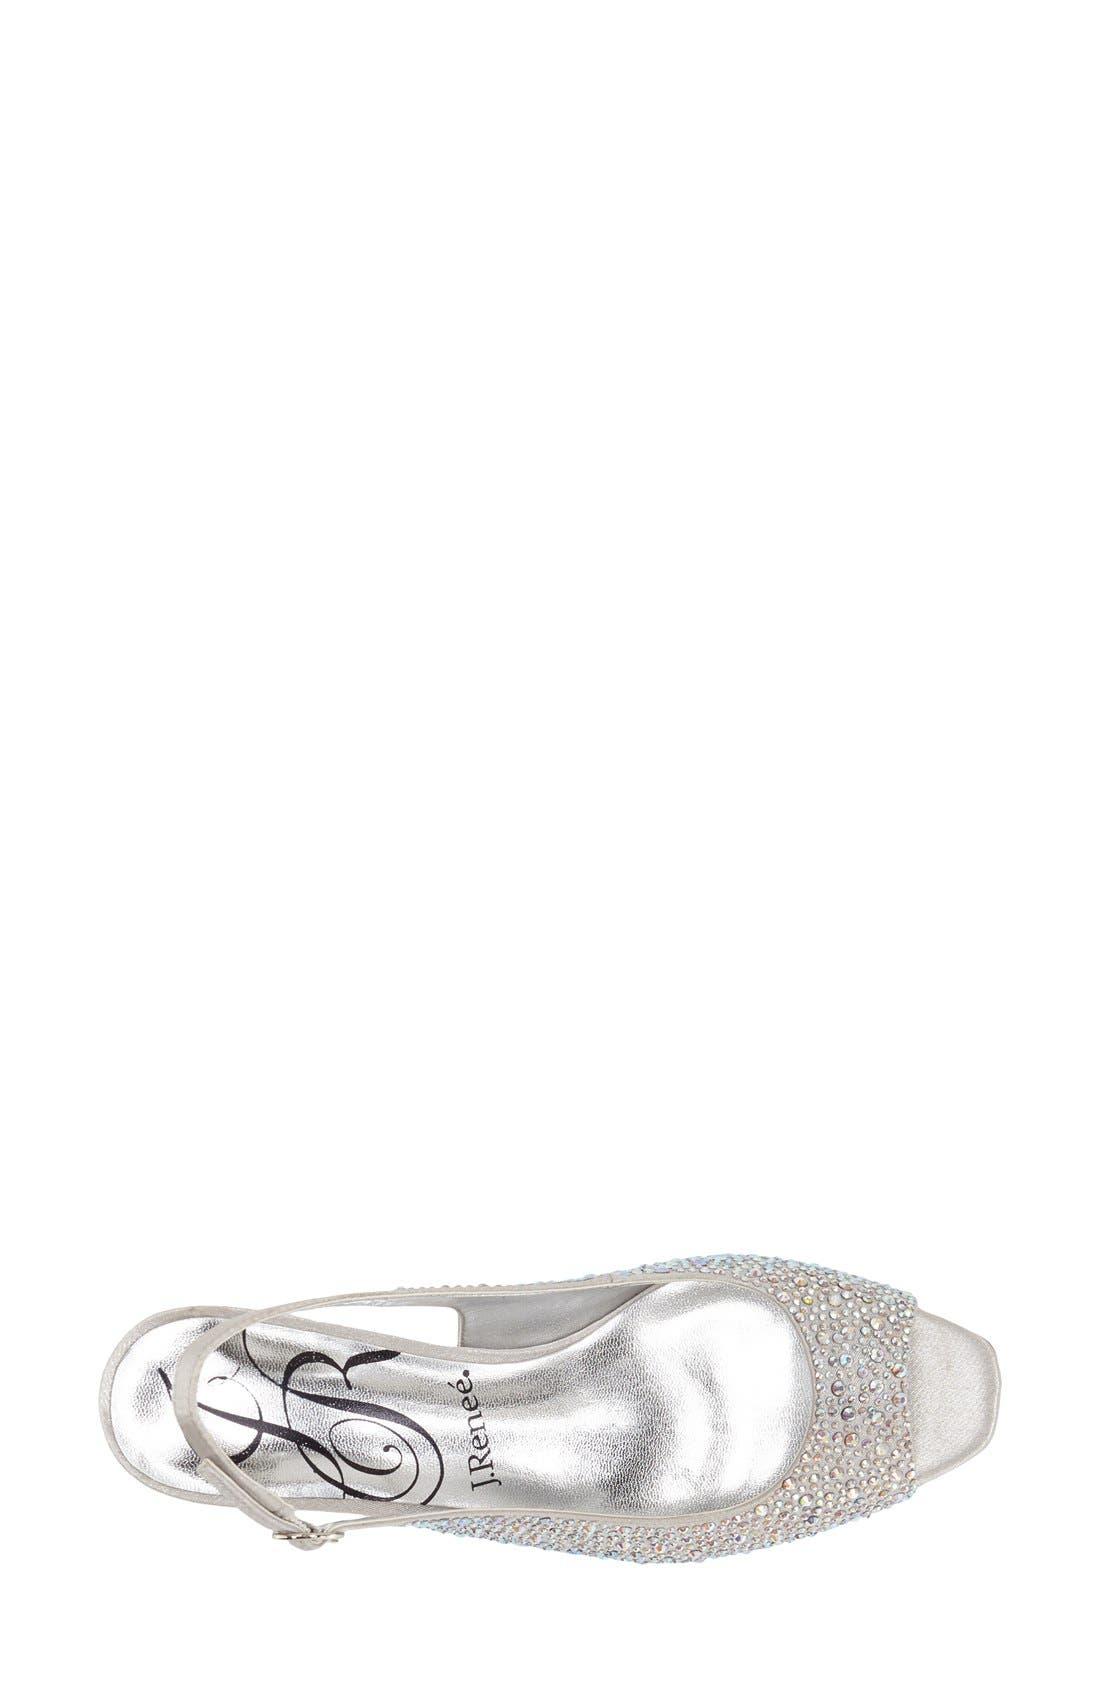 'Impuls' Crystal Embellished Slingback Pump,                             Alternate thumbnail 3, color,                             SILVER